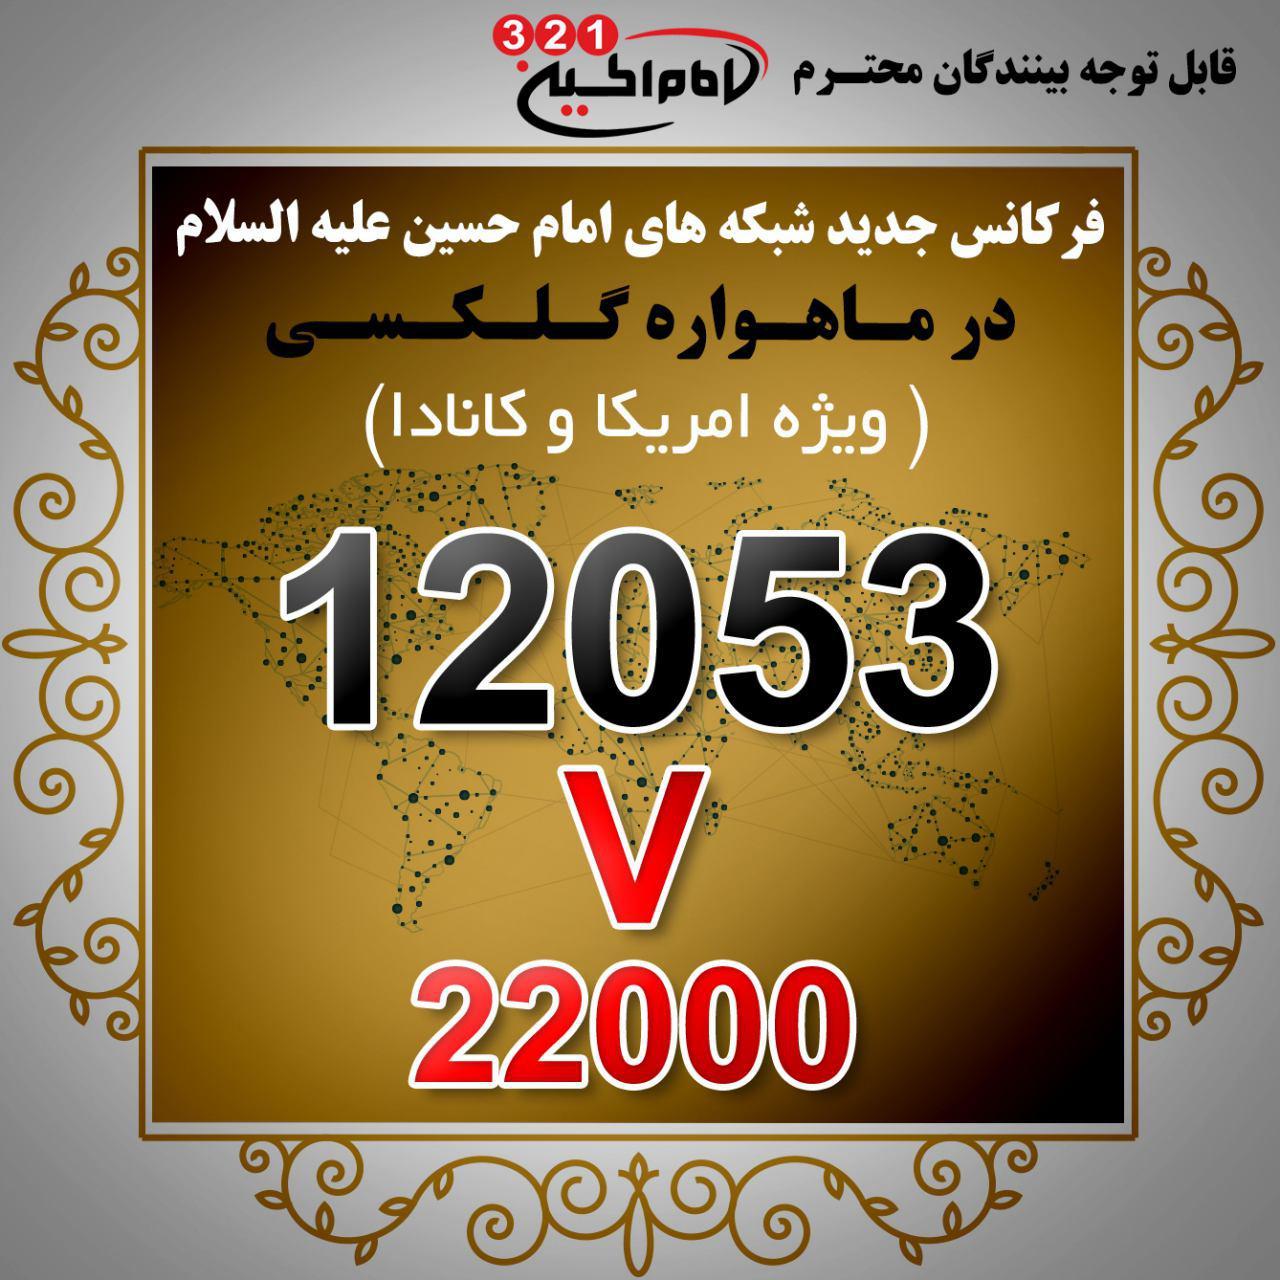 Photo of آغاز مجدد پخش شبكه جهانى امام حسين عليه السلام بر روى ماهواره گلكسى